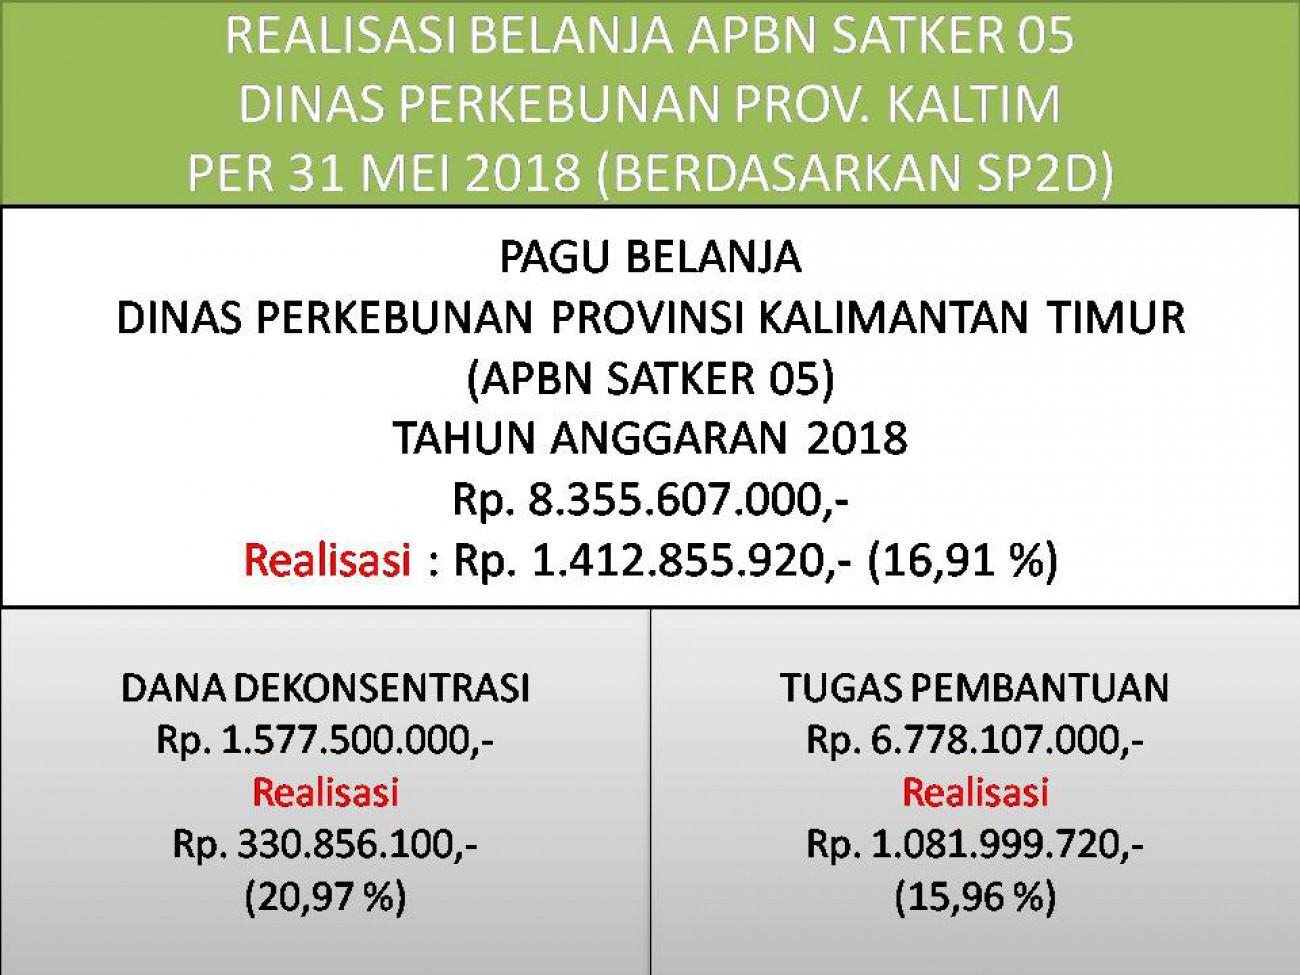 Laporan Realisasi APBN Satker 05 (Direktorat Jenderal Perkebunan) Dinas Perkebunan Prov. Kaltim Bulan Mei 2018